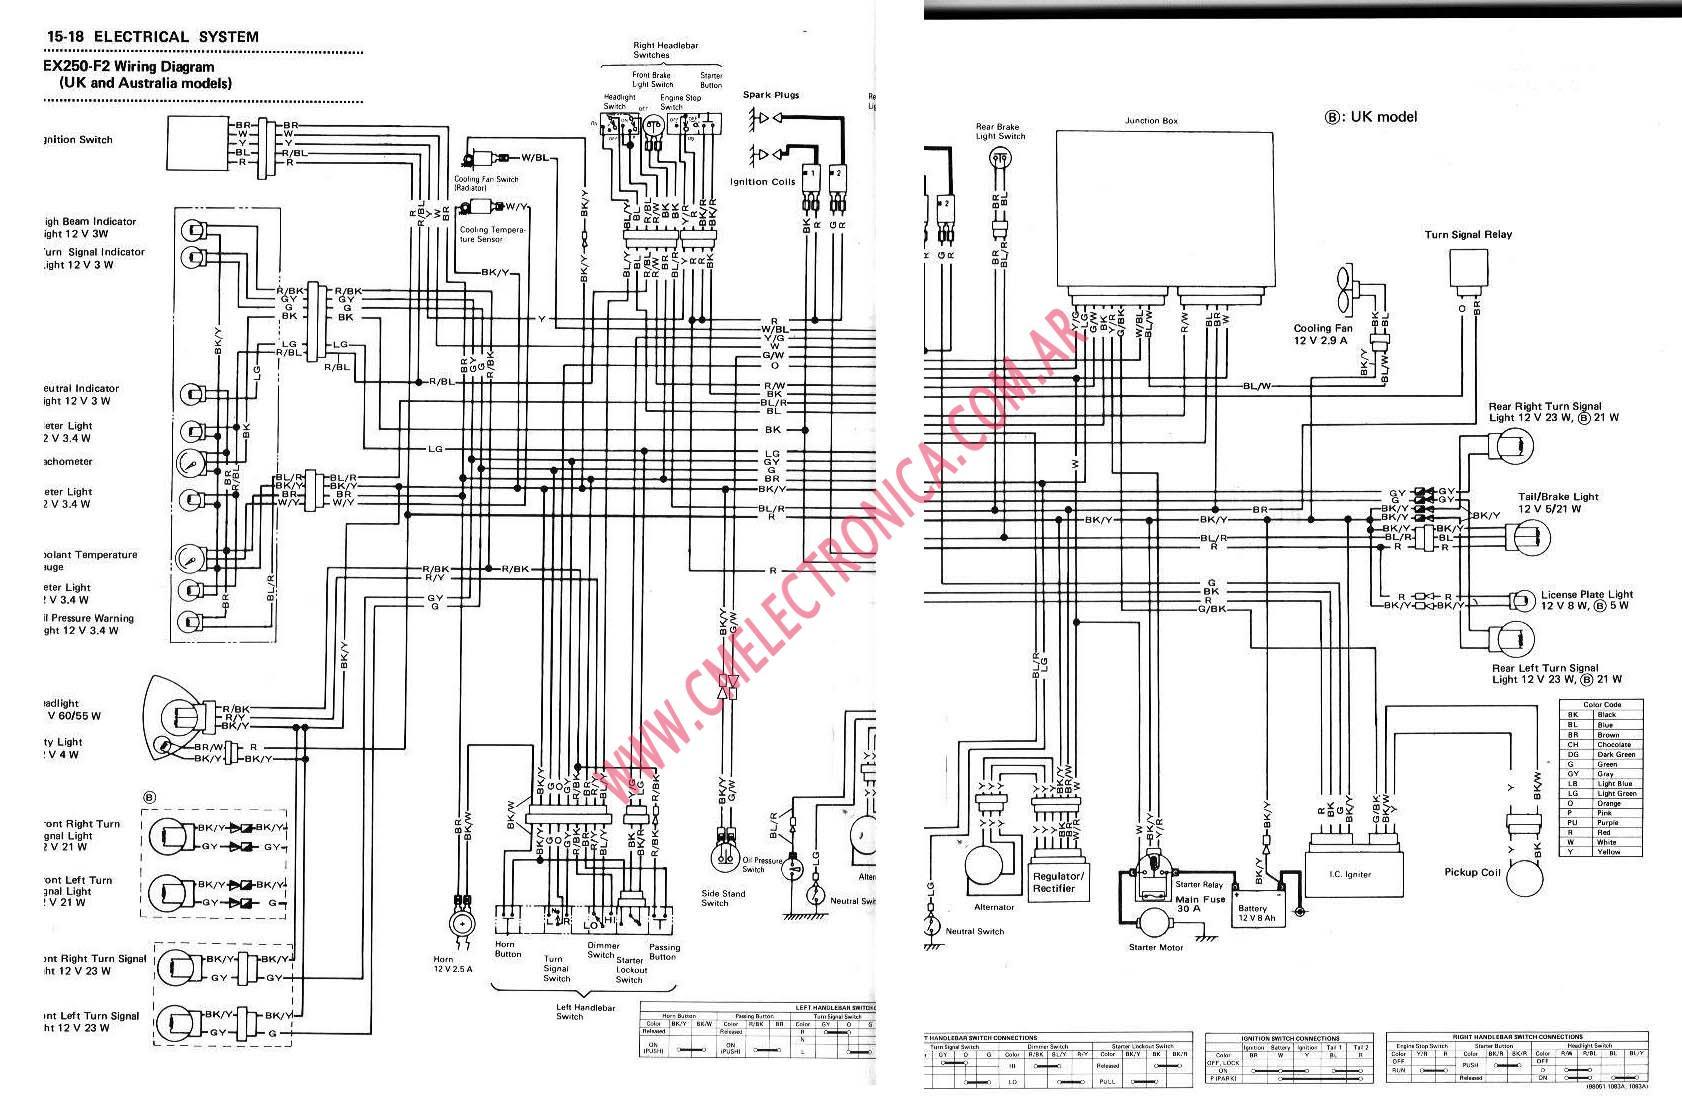 Kawasaki 300 4x4 Wiring Diagram Wiring Diagram Please Last A Please Last A Emilia Fise It